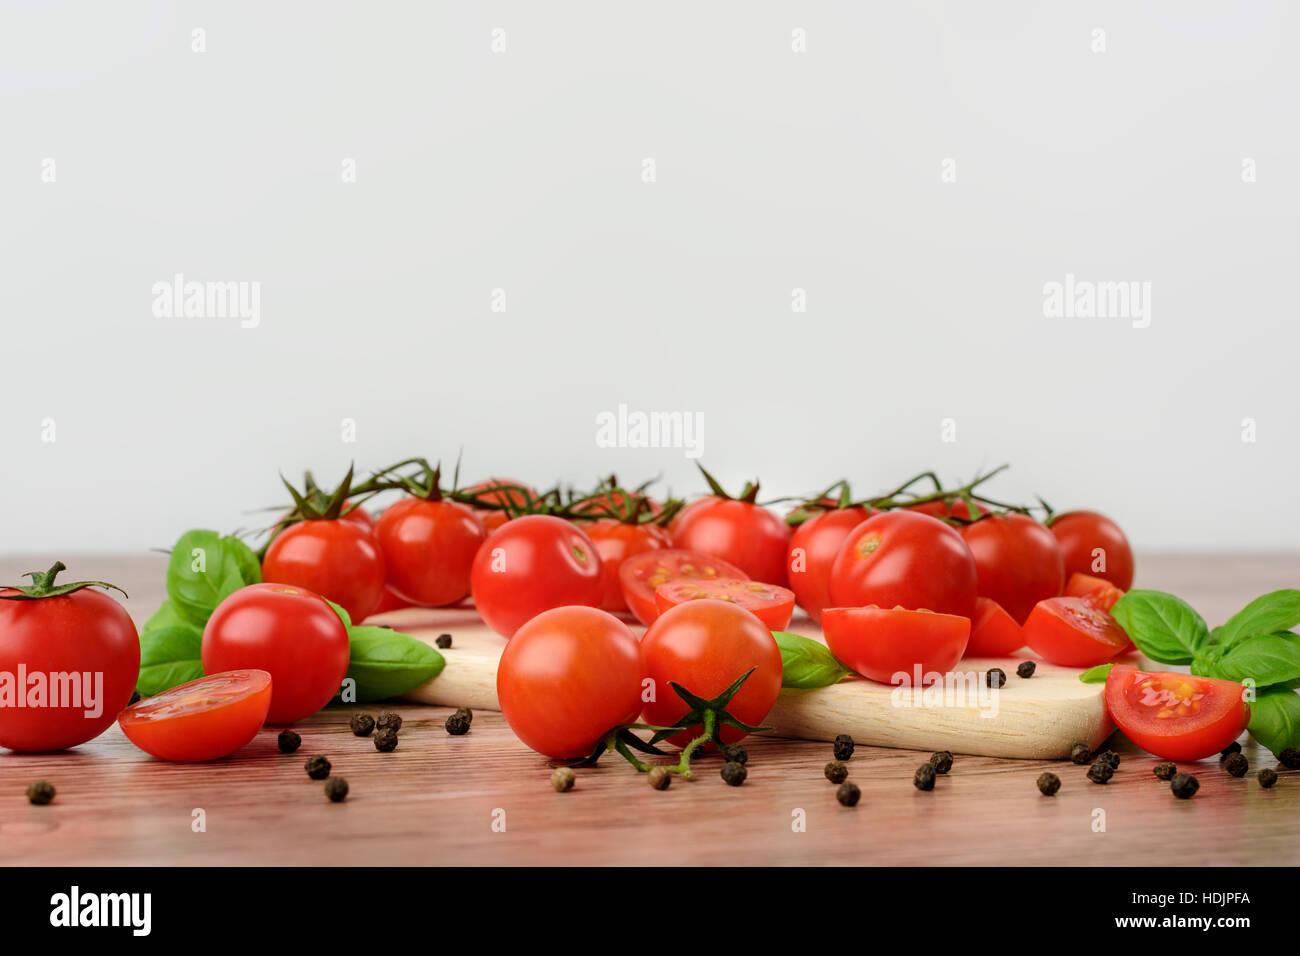 Mini tomaotes sobre la mesa de madera con fondo brillante. Imagen De Stock